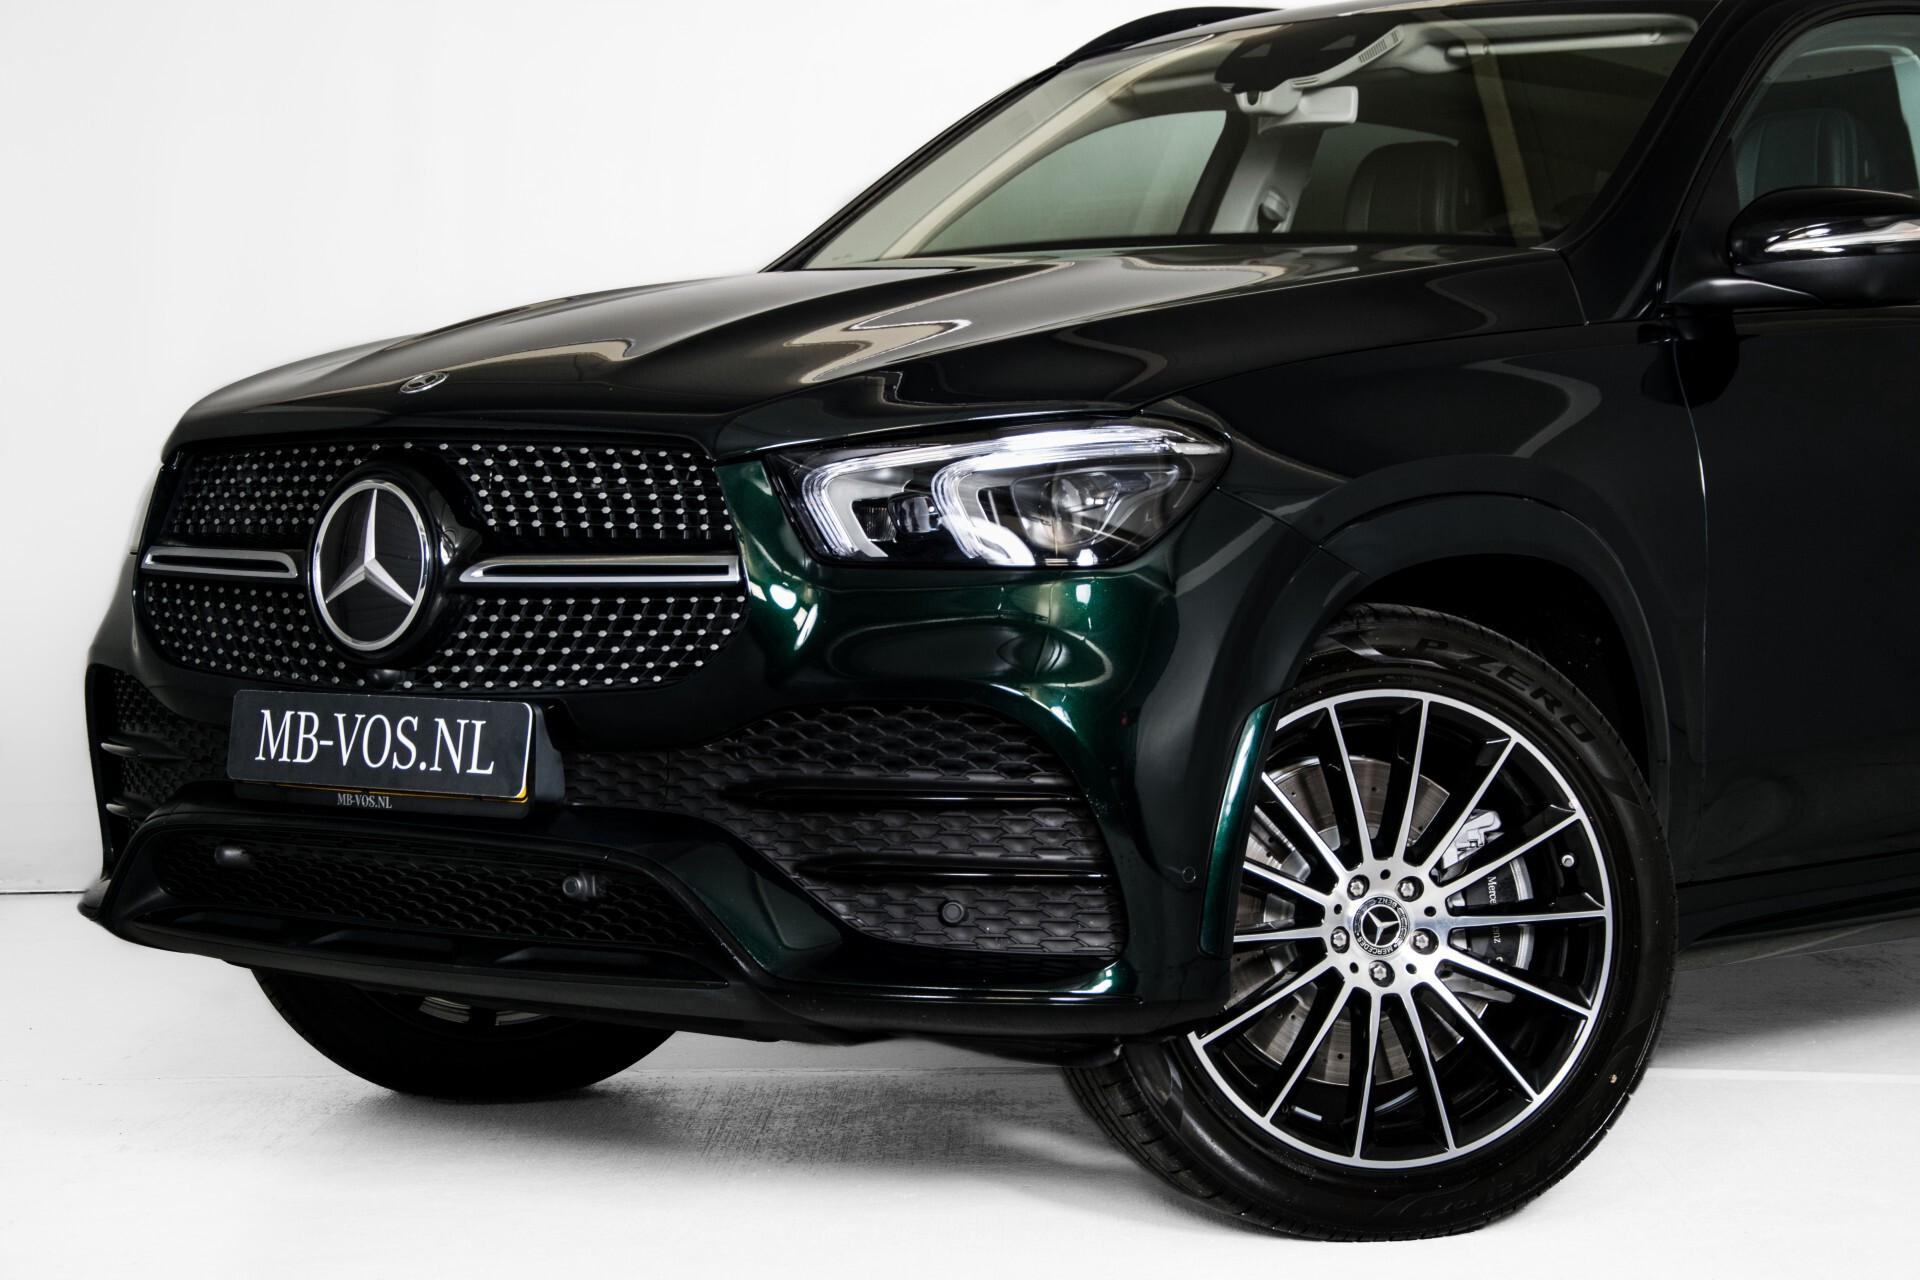 Mercedes-Benz GLE 450 4-M 7-Persoons AMG Massage/Rij-assist/Keyless/TV/360/Night/Trekhaak Aut9 Foto 71